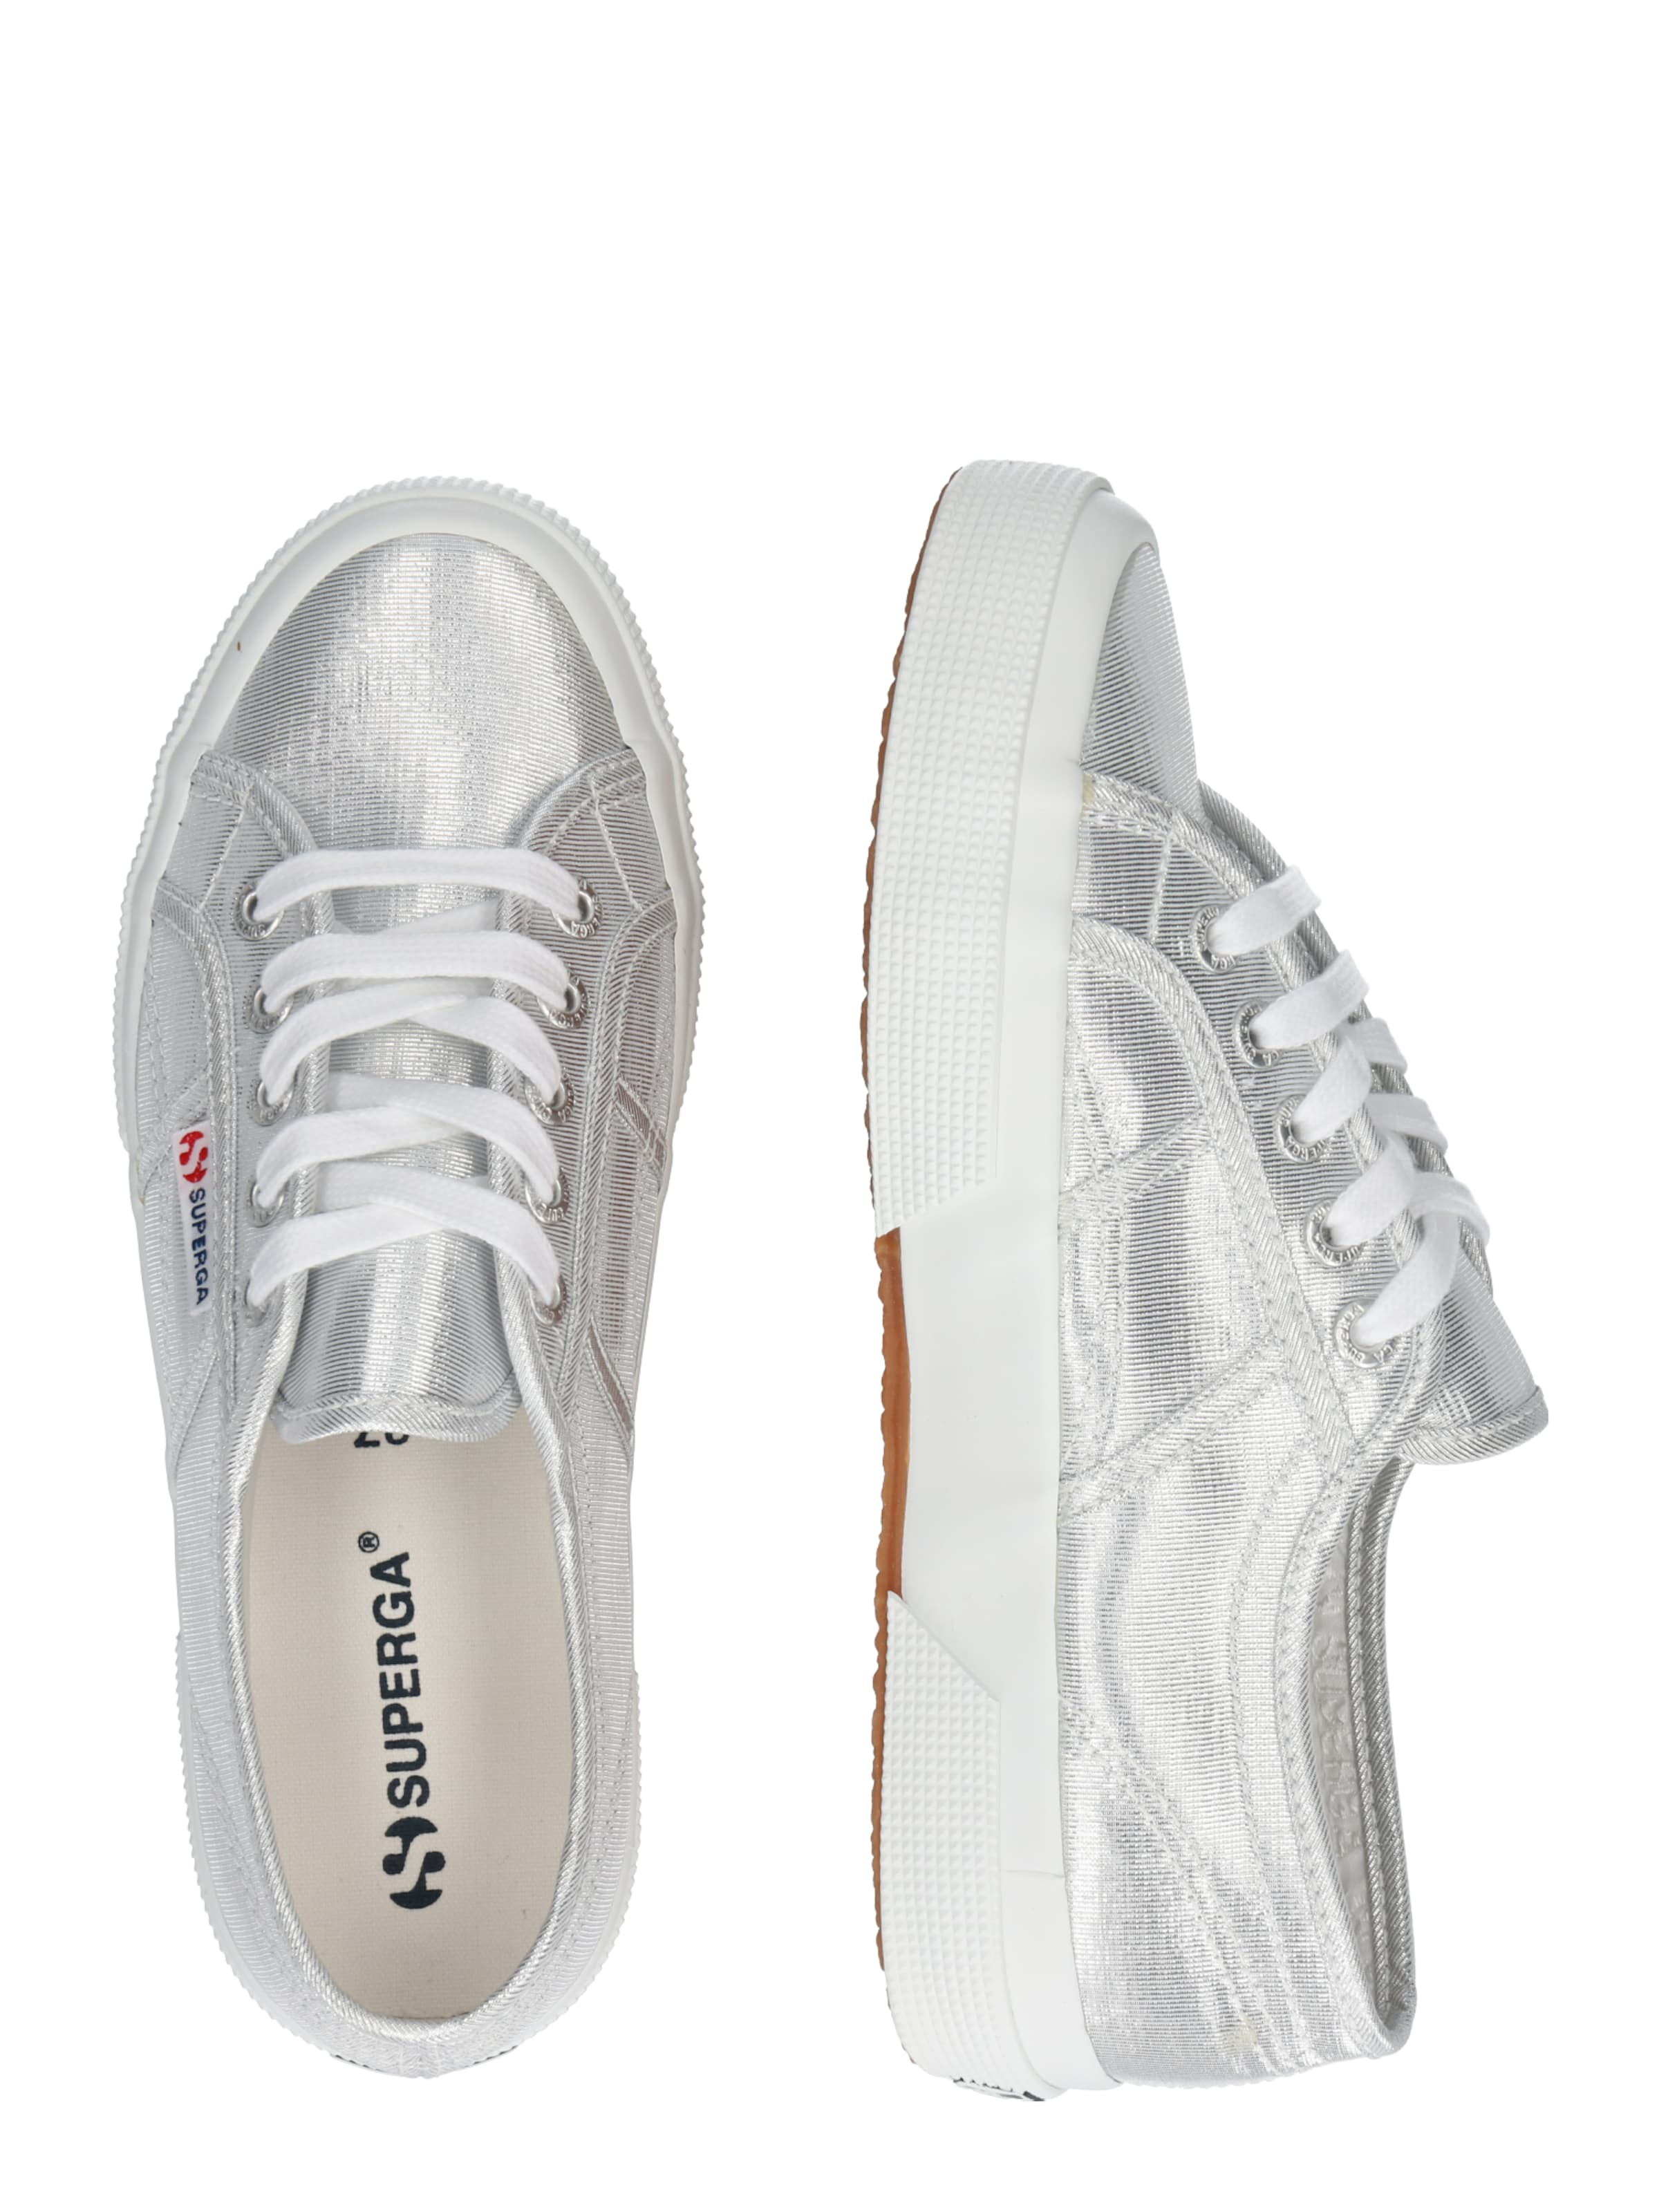 microlamew' In Silber Superga Sneaker '2750 eCBxWQdroE